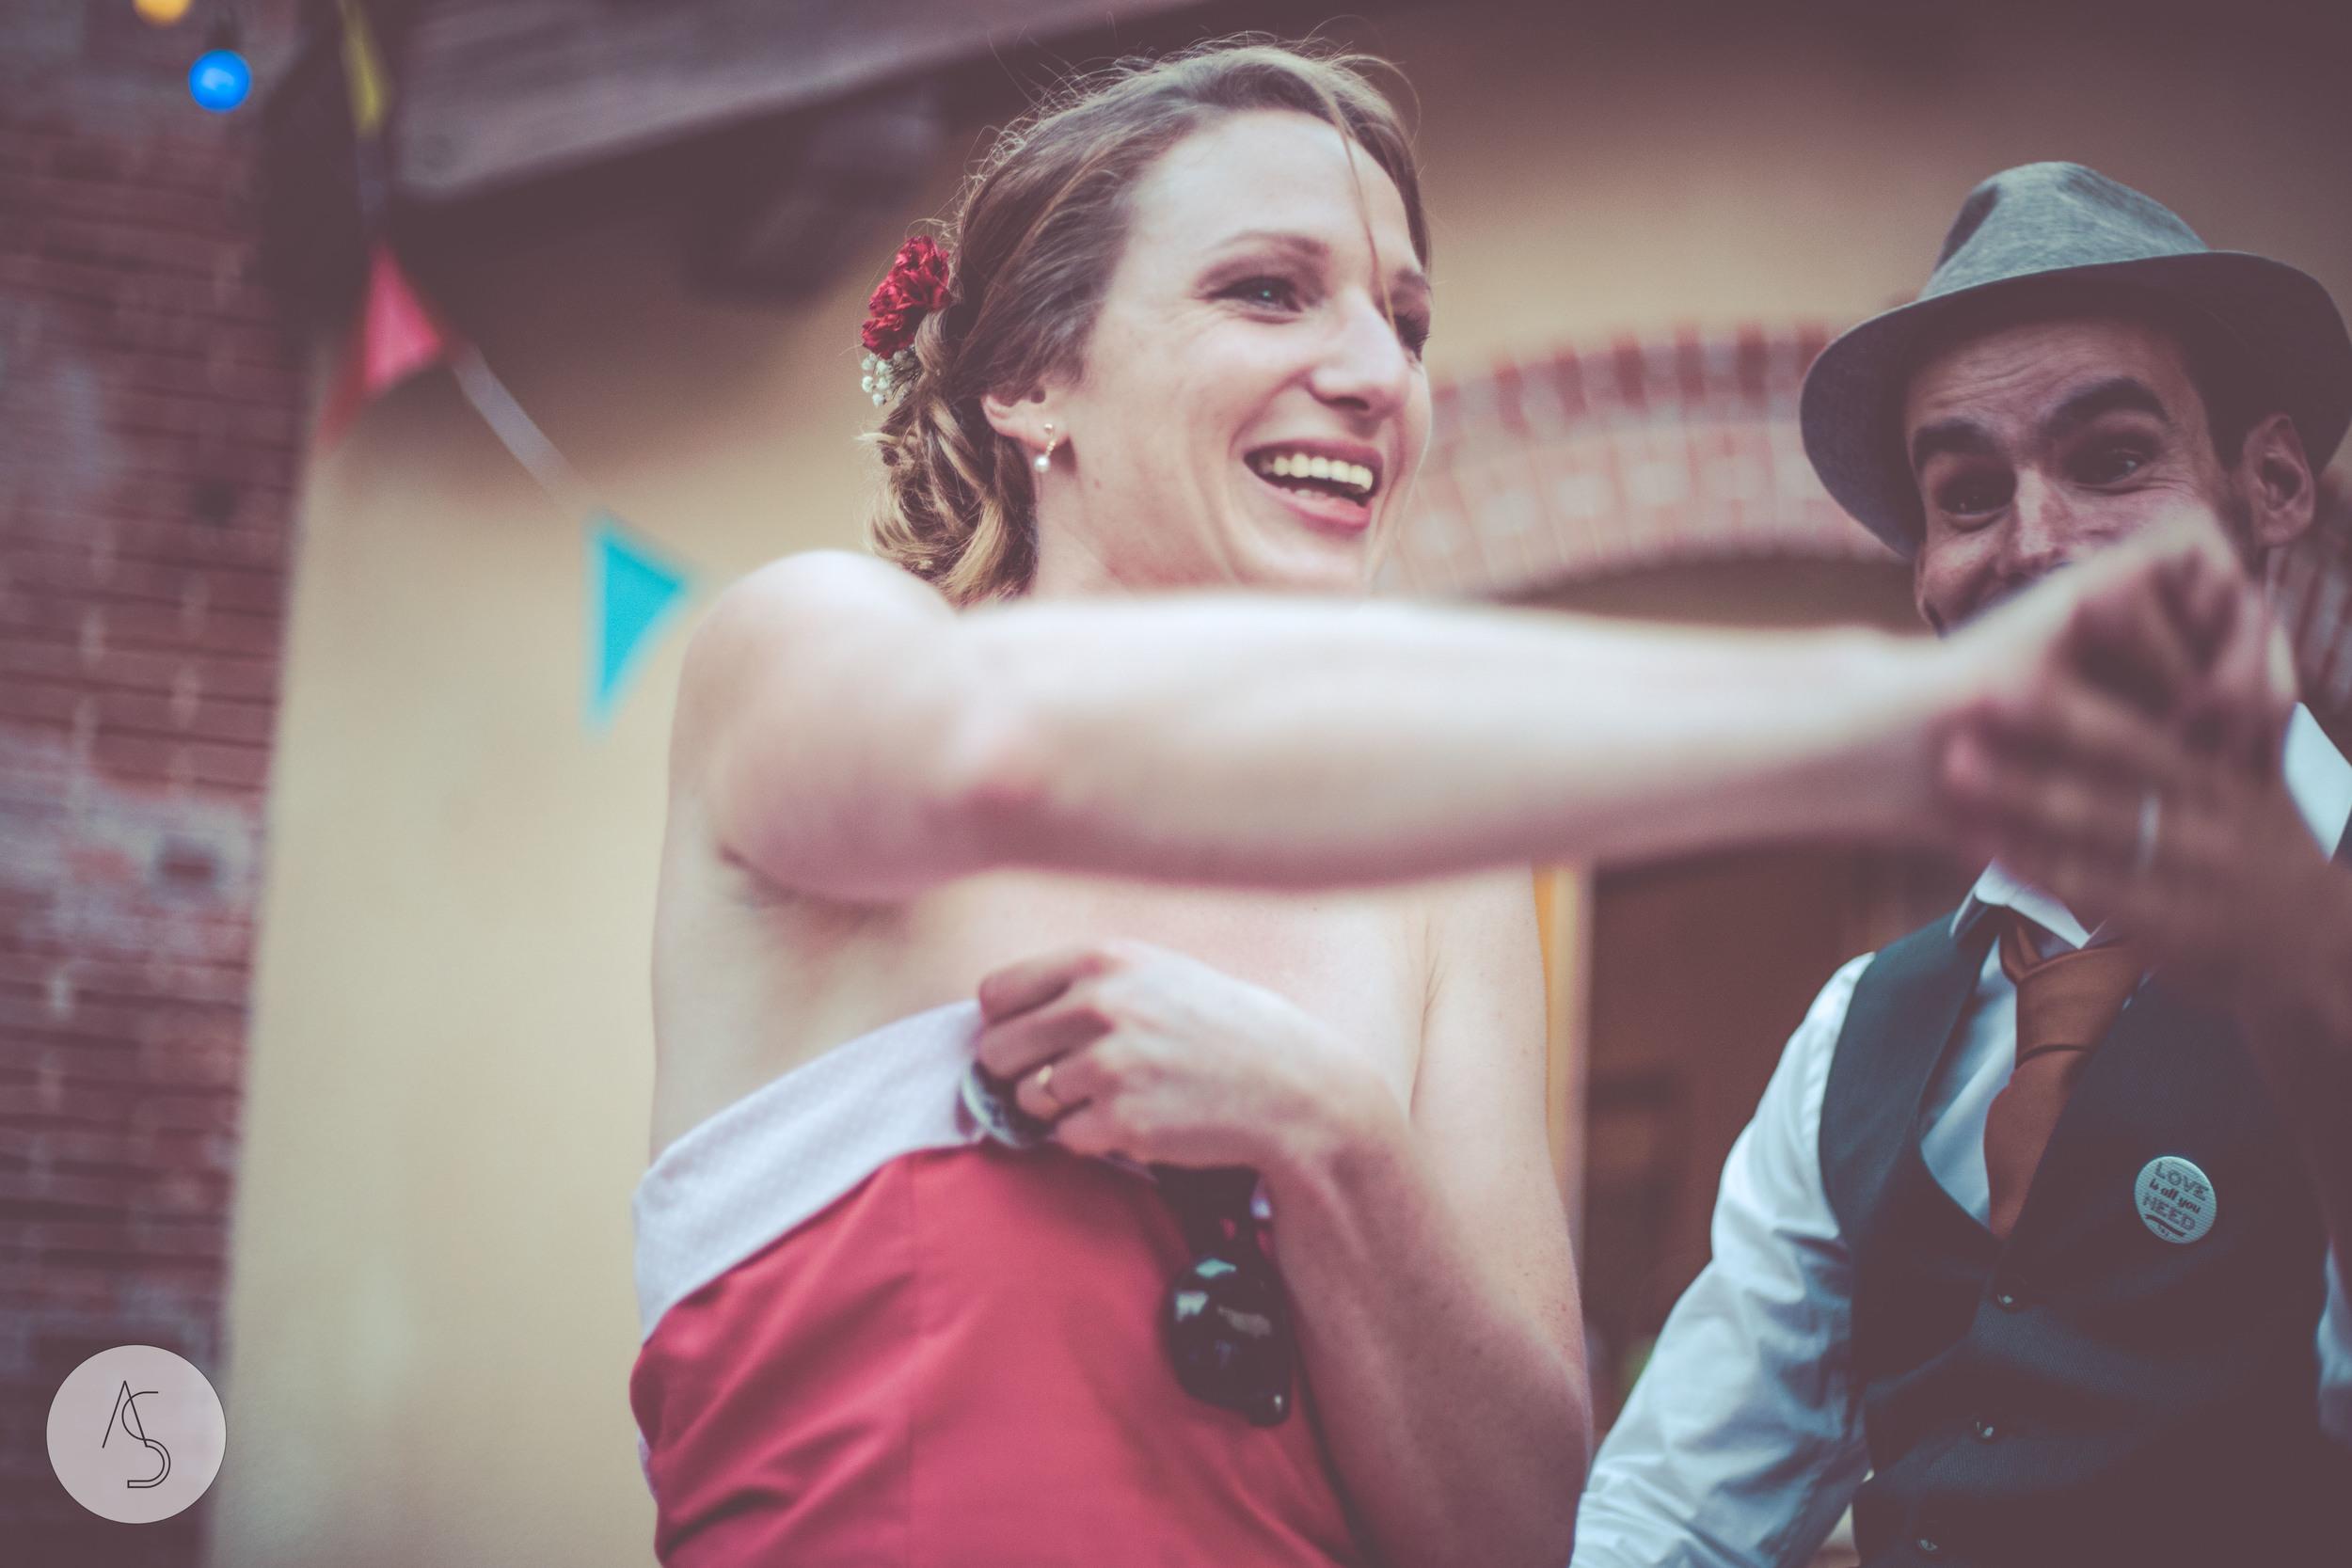 photographe mariage - Grenoble - Rhone Alpes - Adriana Salazar photo-148.jpg